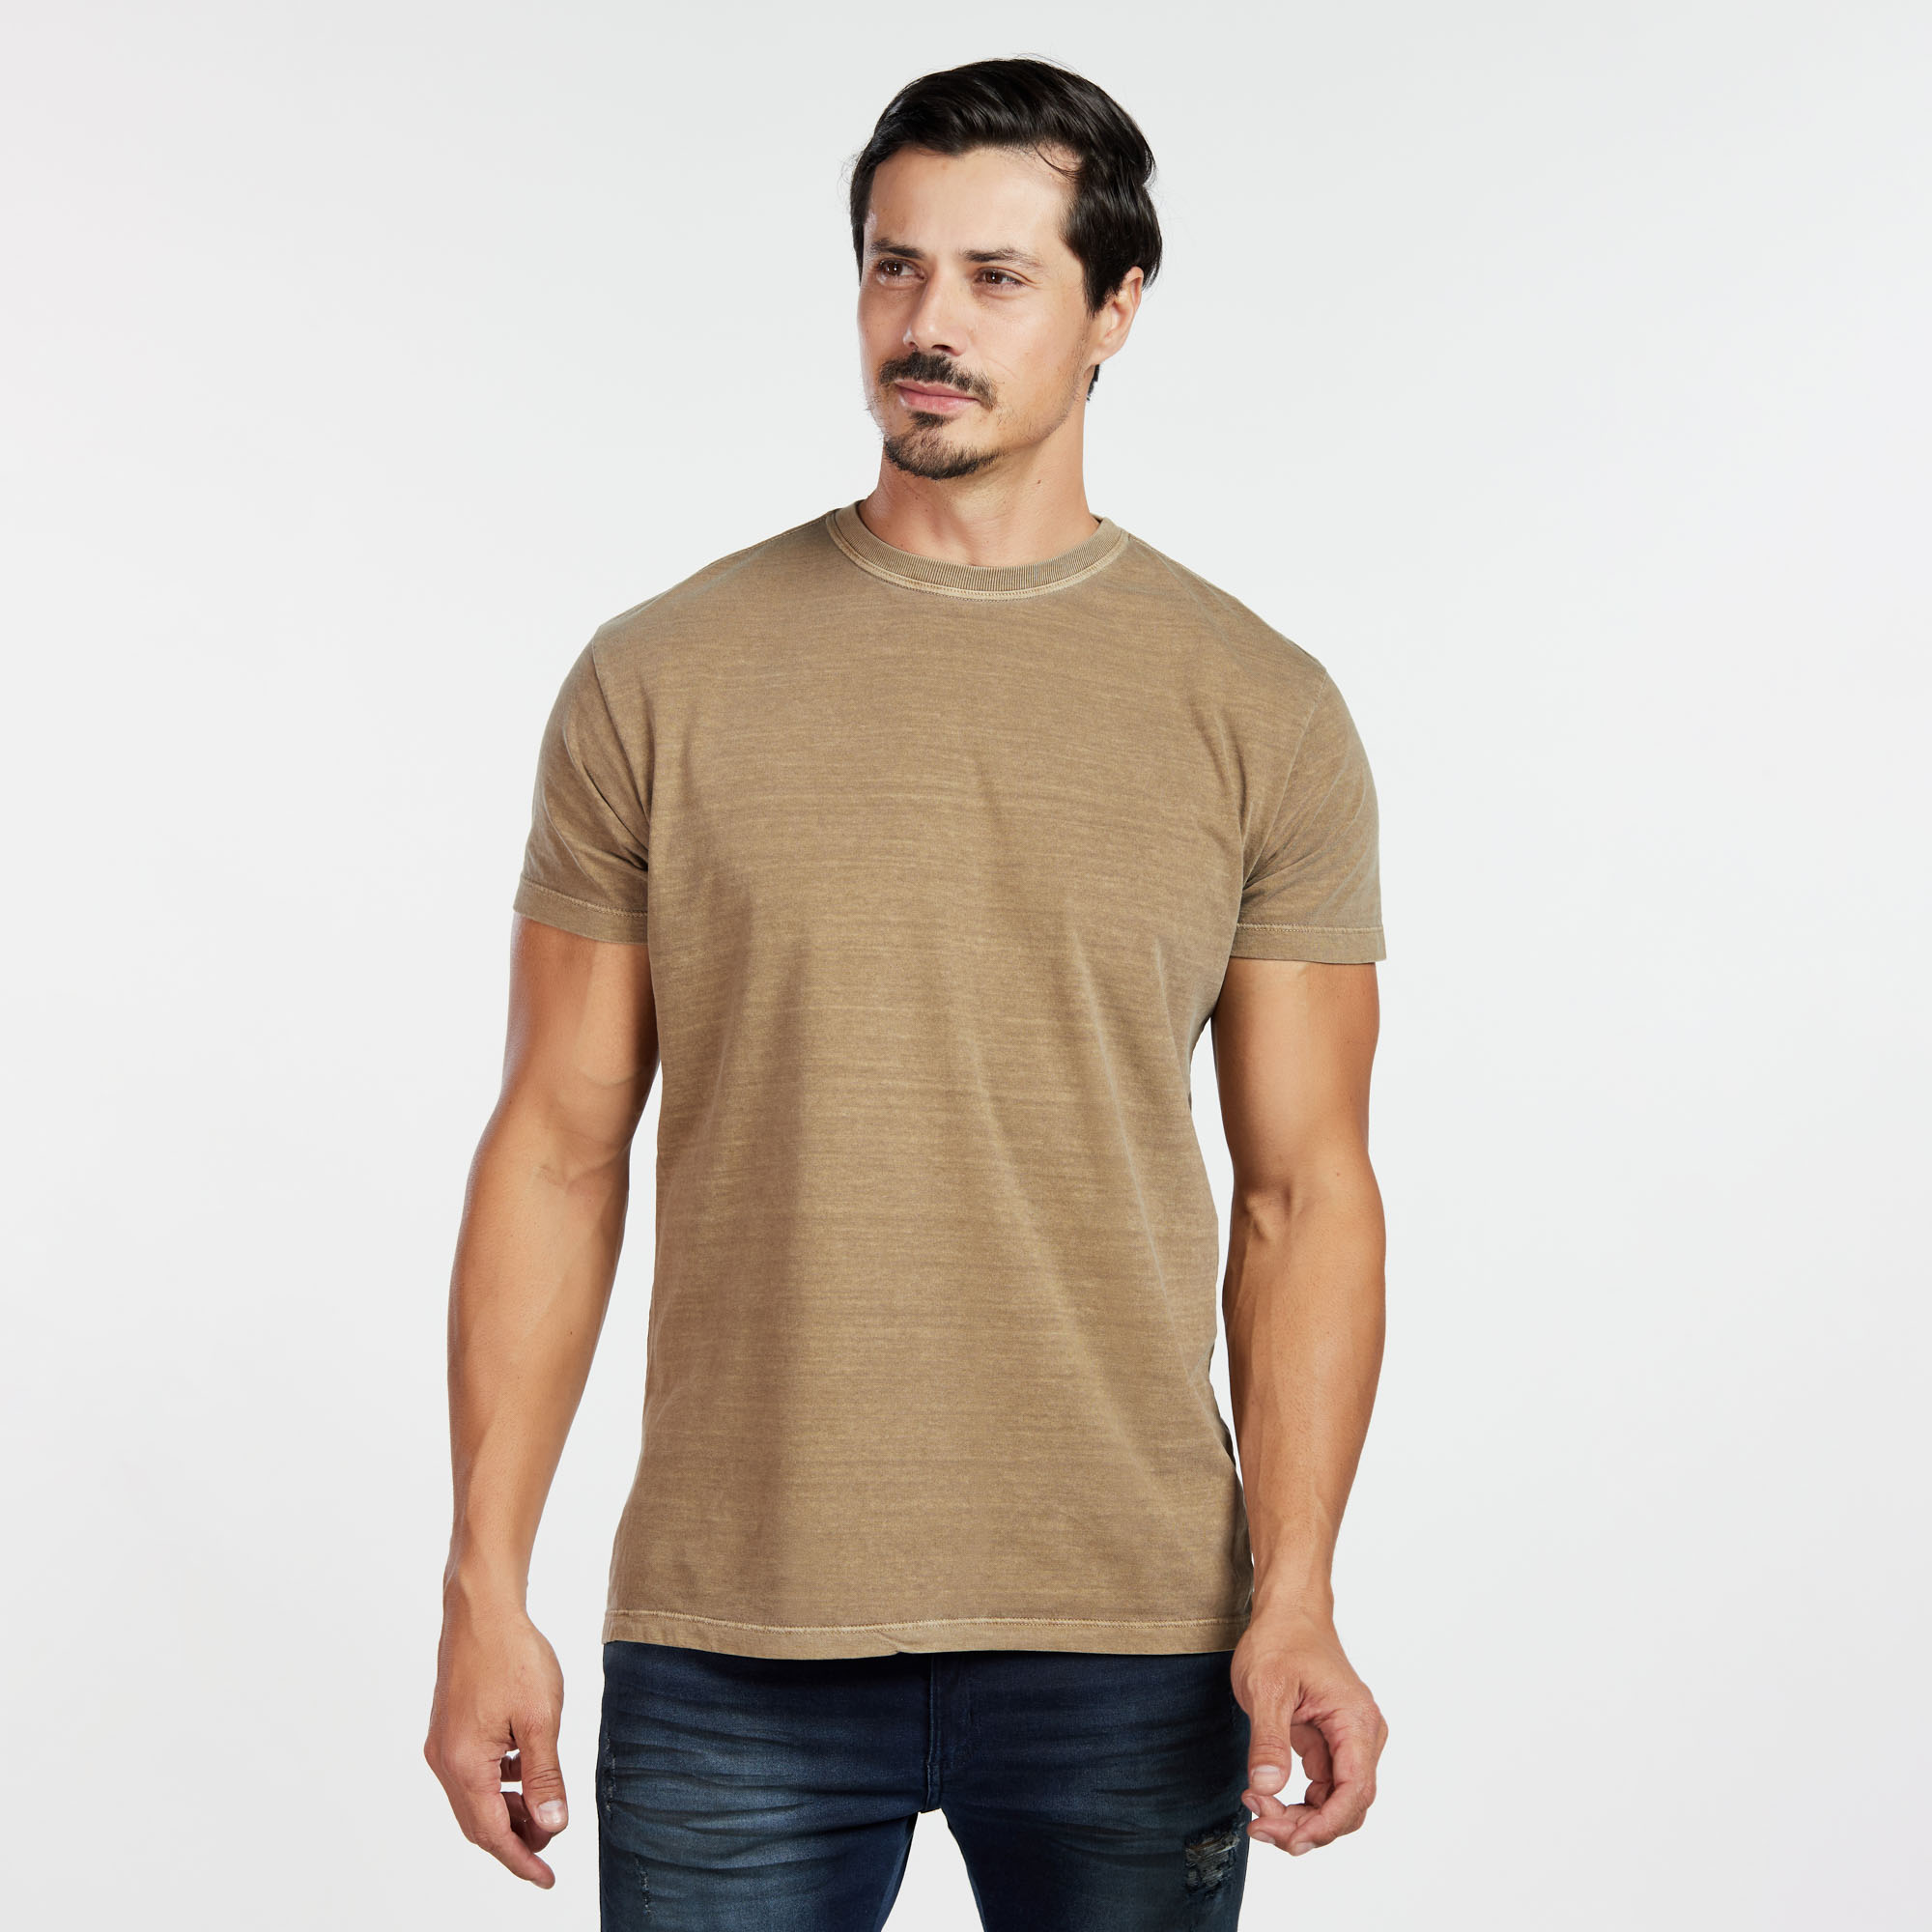 Camiseta Masculina Estonada Marrom